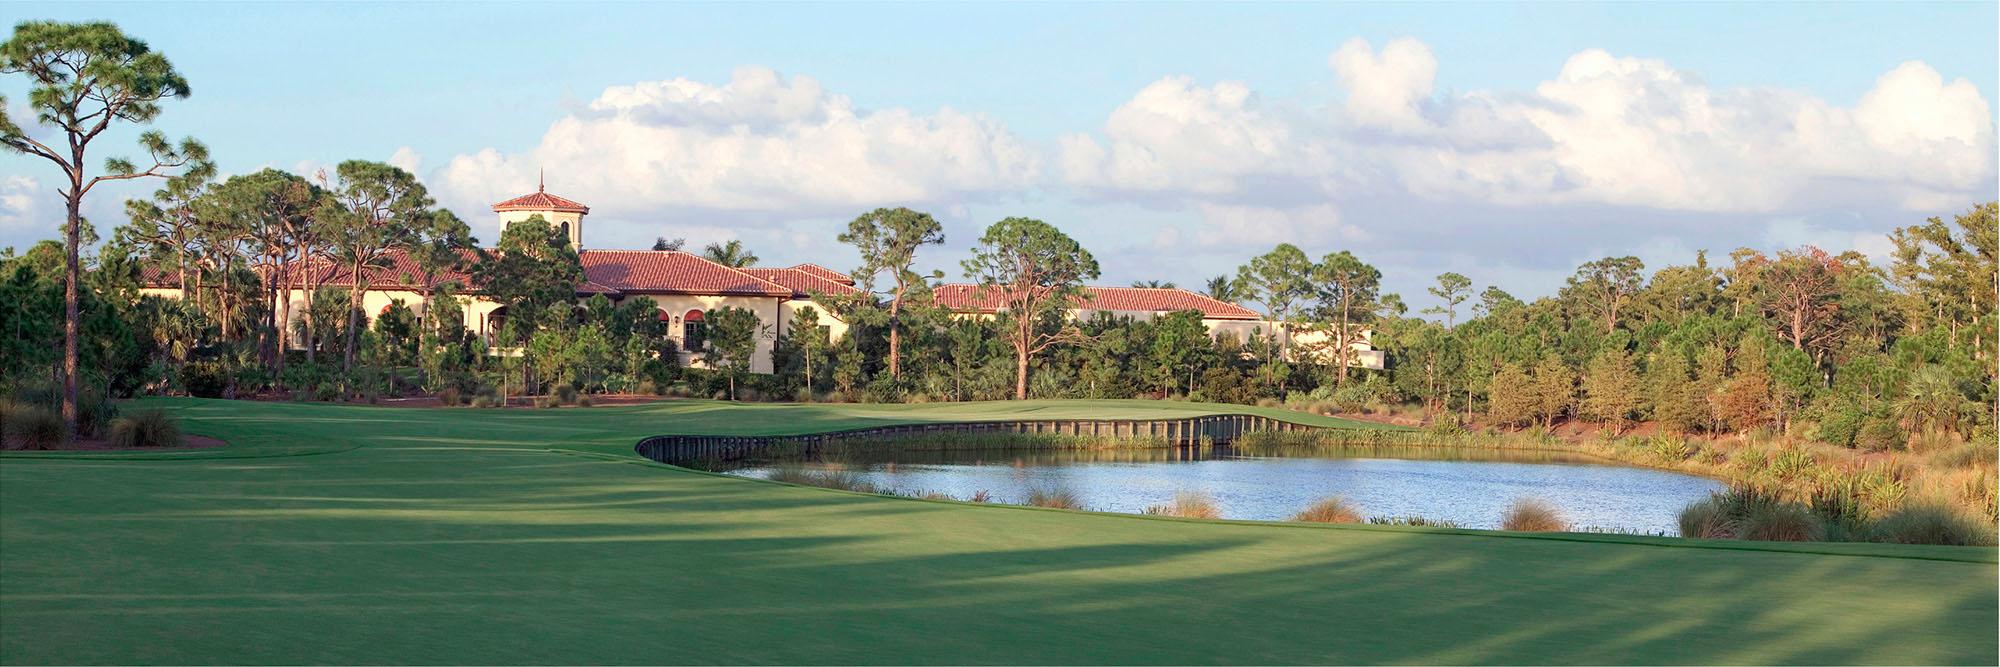 Golf Course Image - Ritz Carlton Jupiter No. 18